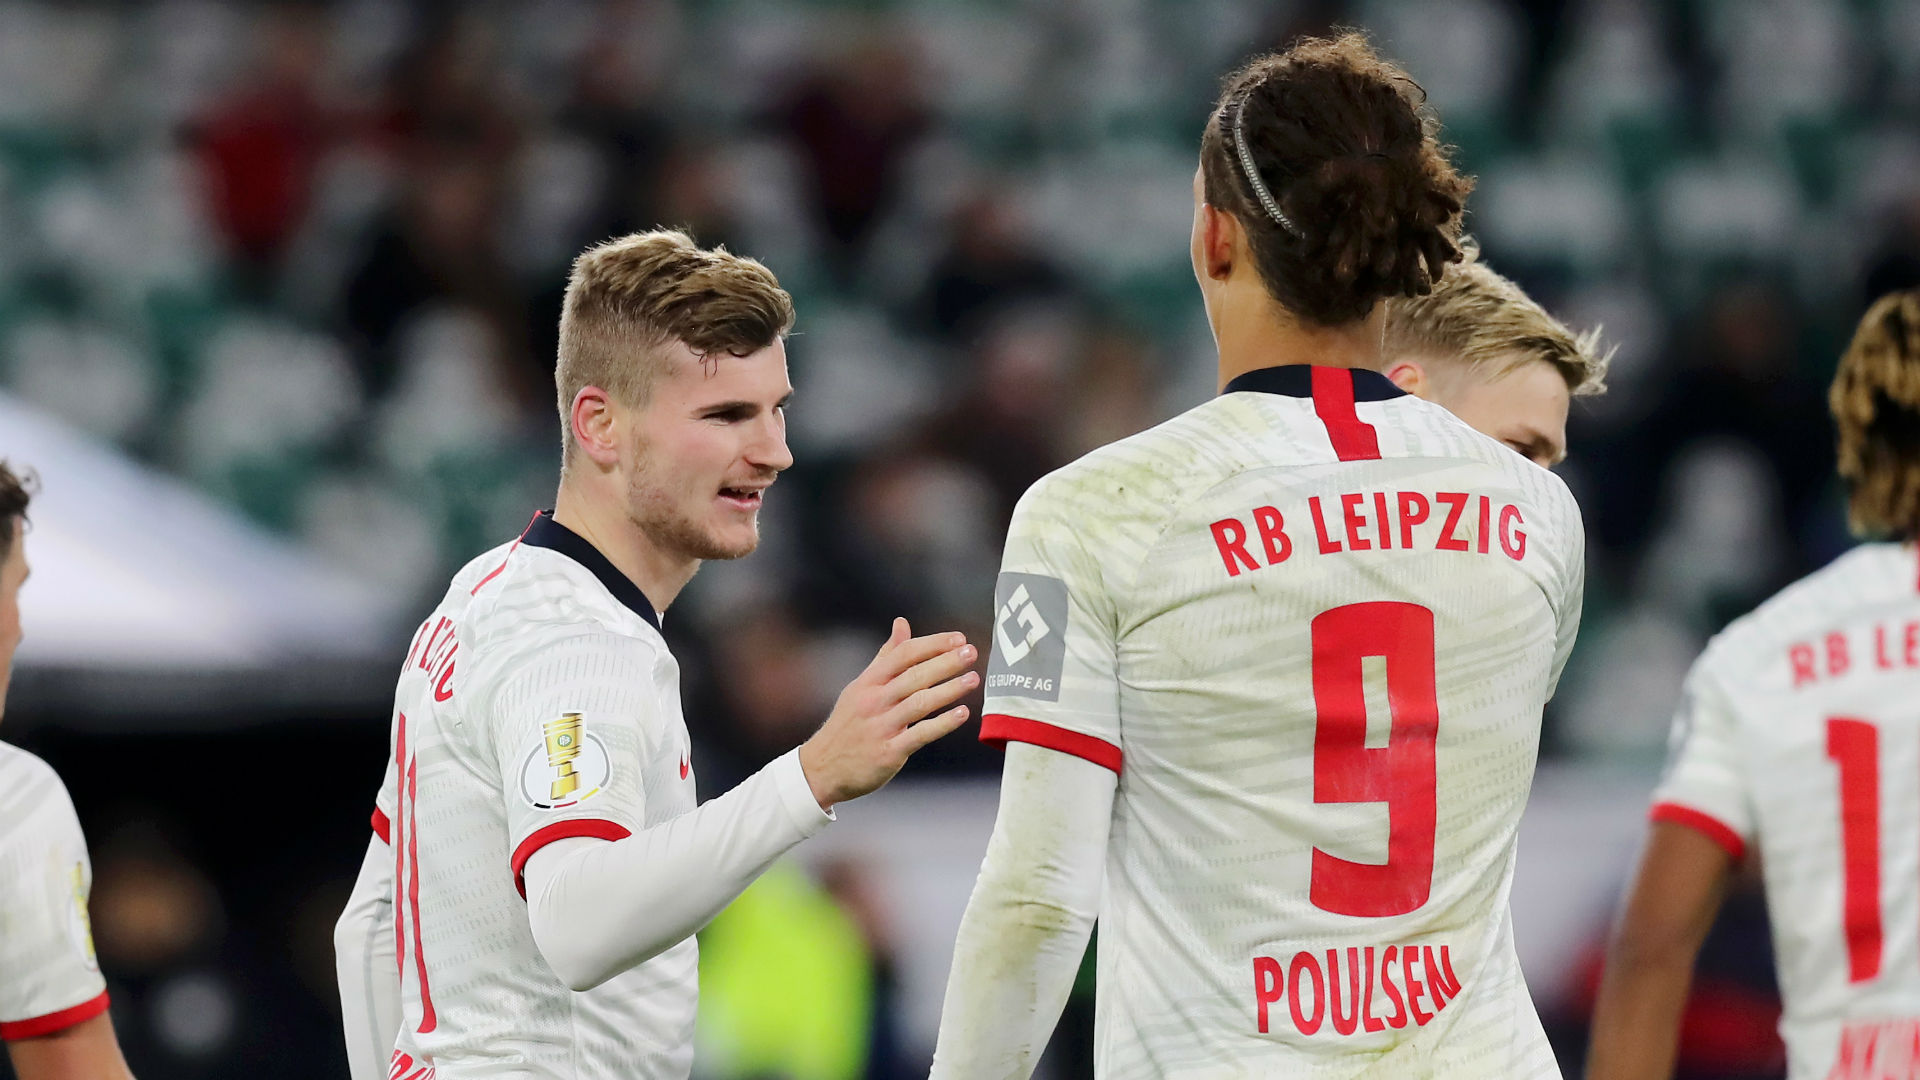 Werner S Future Is Up To Him Says Rb Leipzig Team Mate Poulsen Bundesliga News Stadium Astro